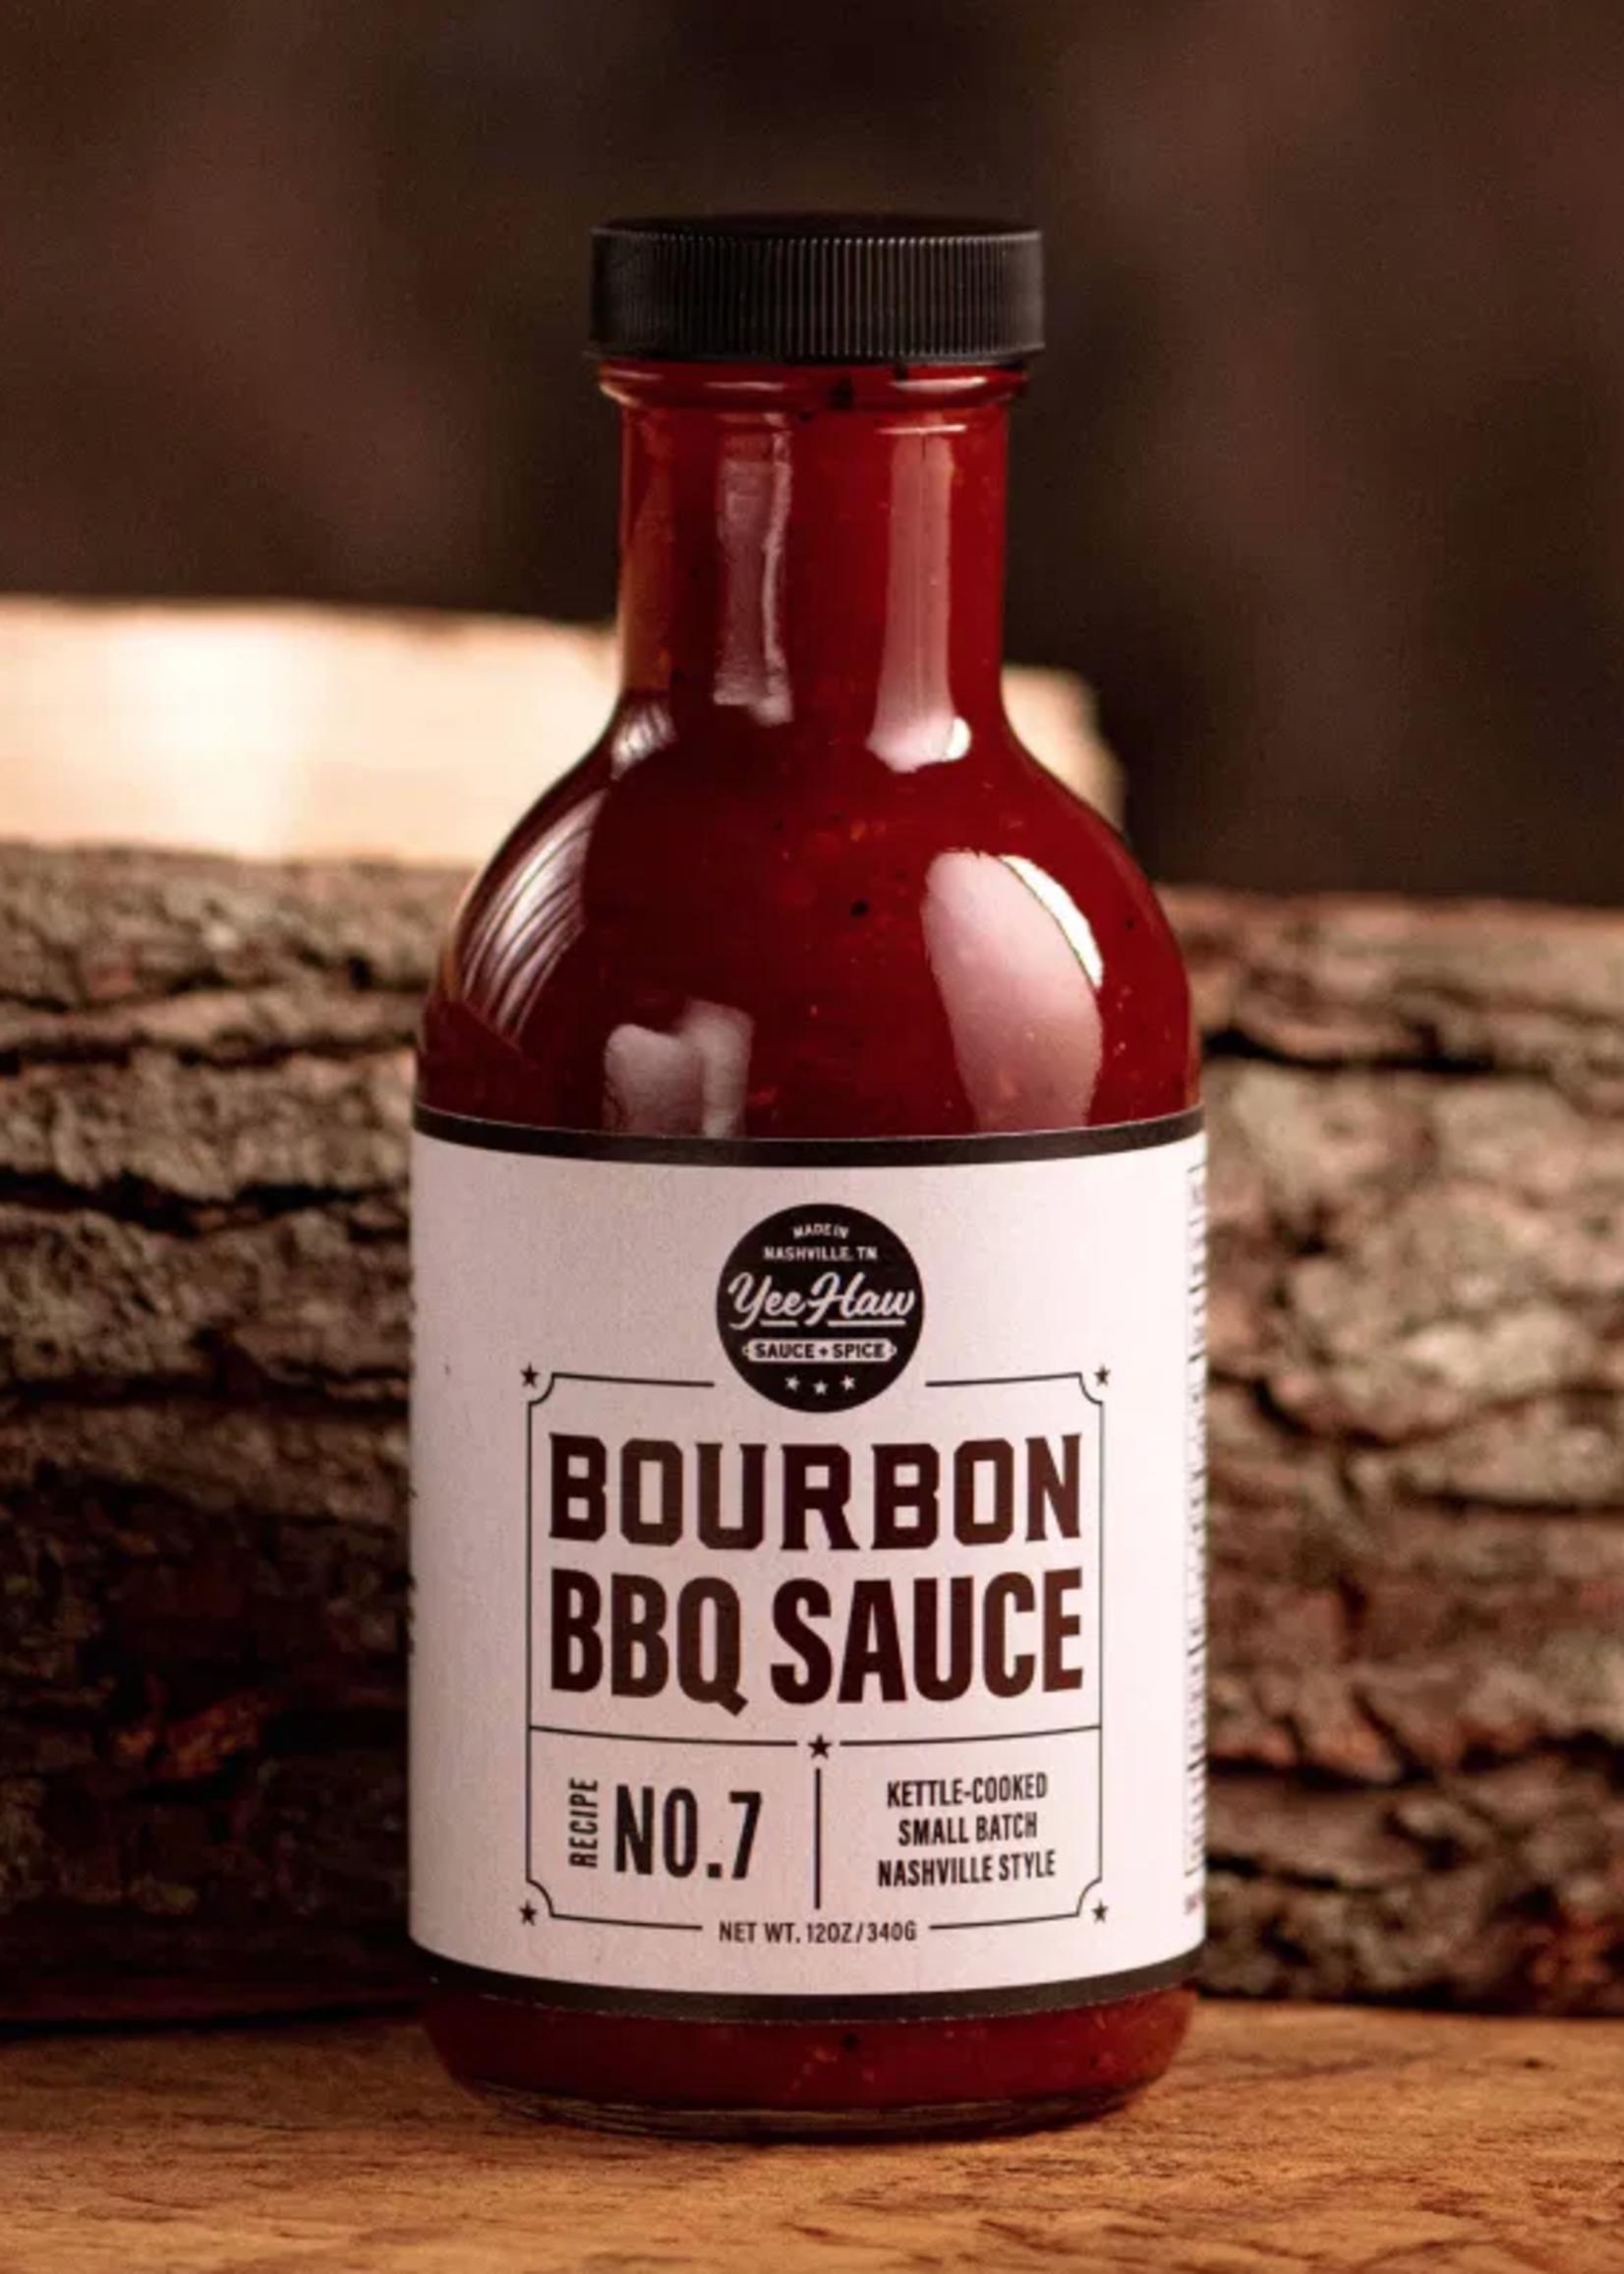 Yee Haw Sauce + Spice Bourbon Barbeque Sauce - 12 oz